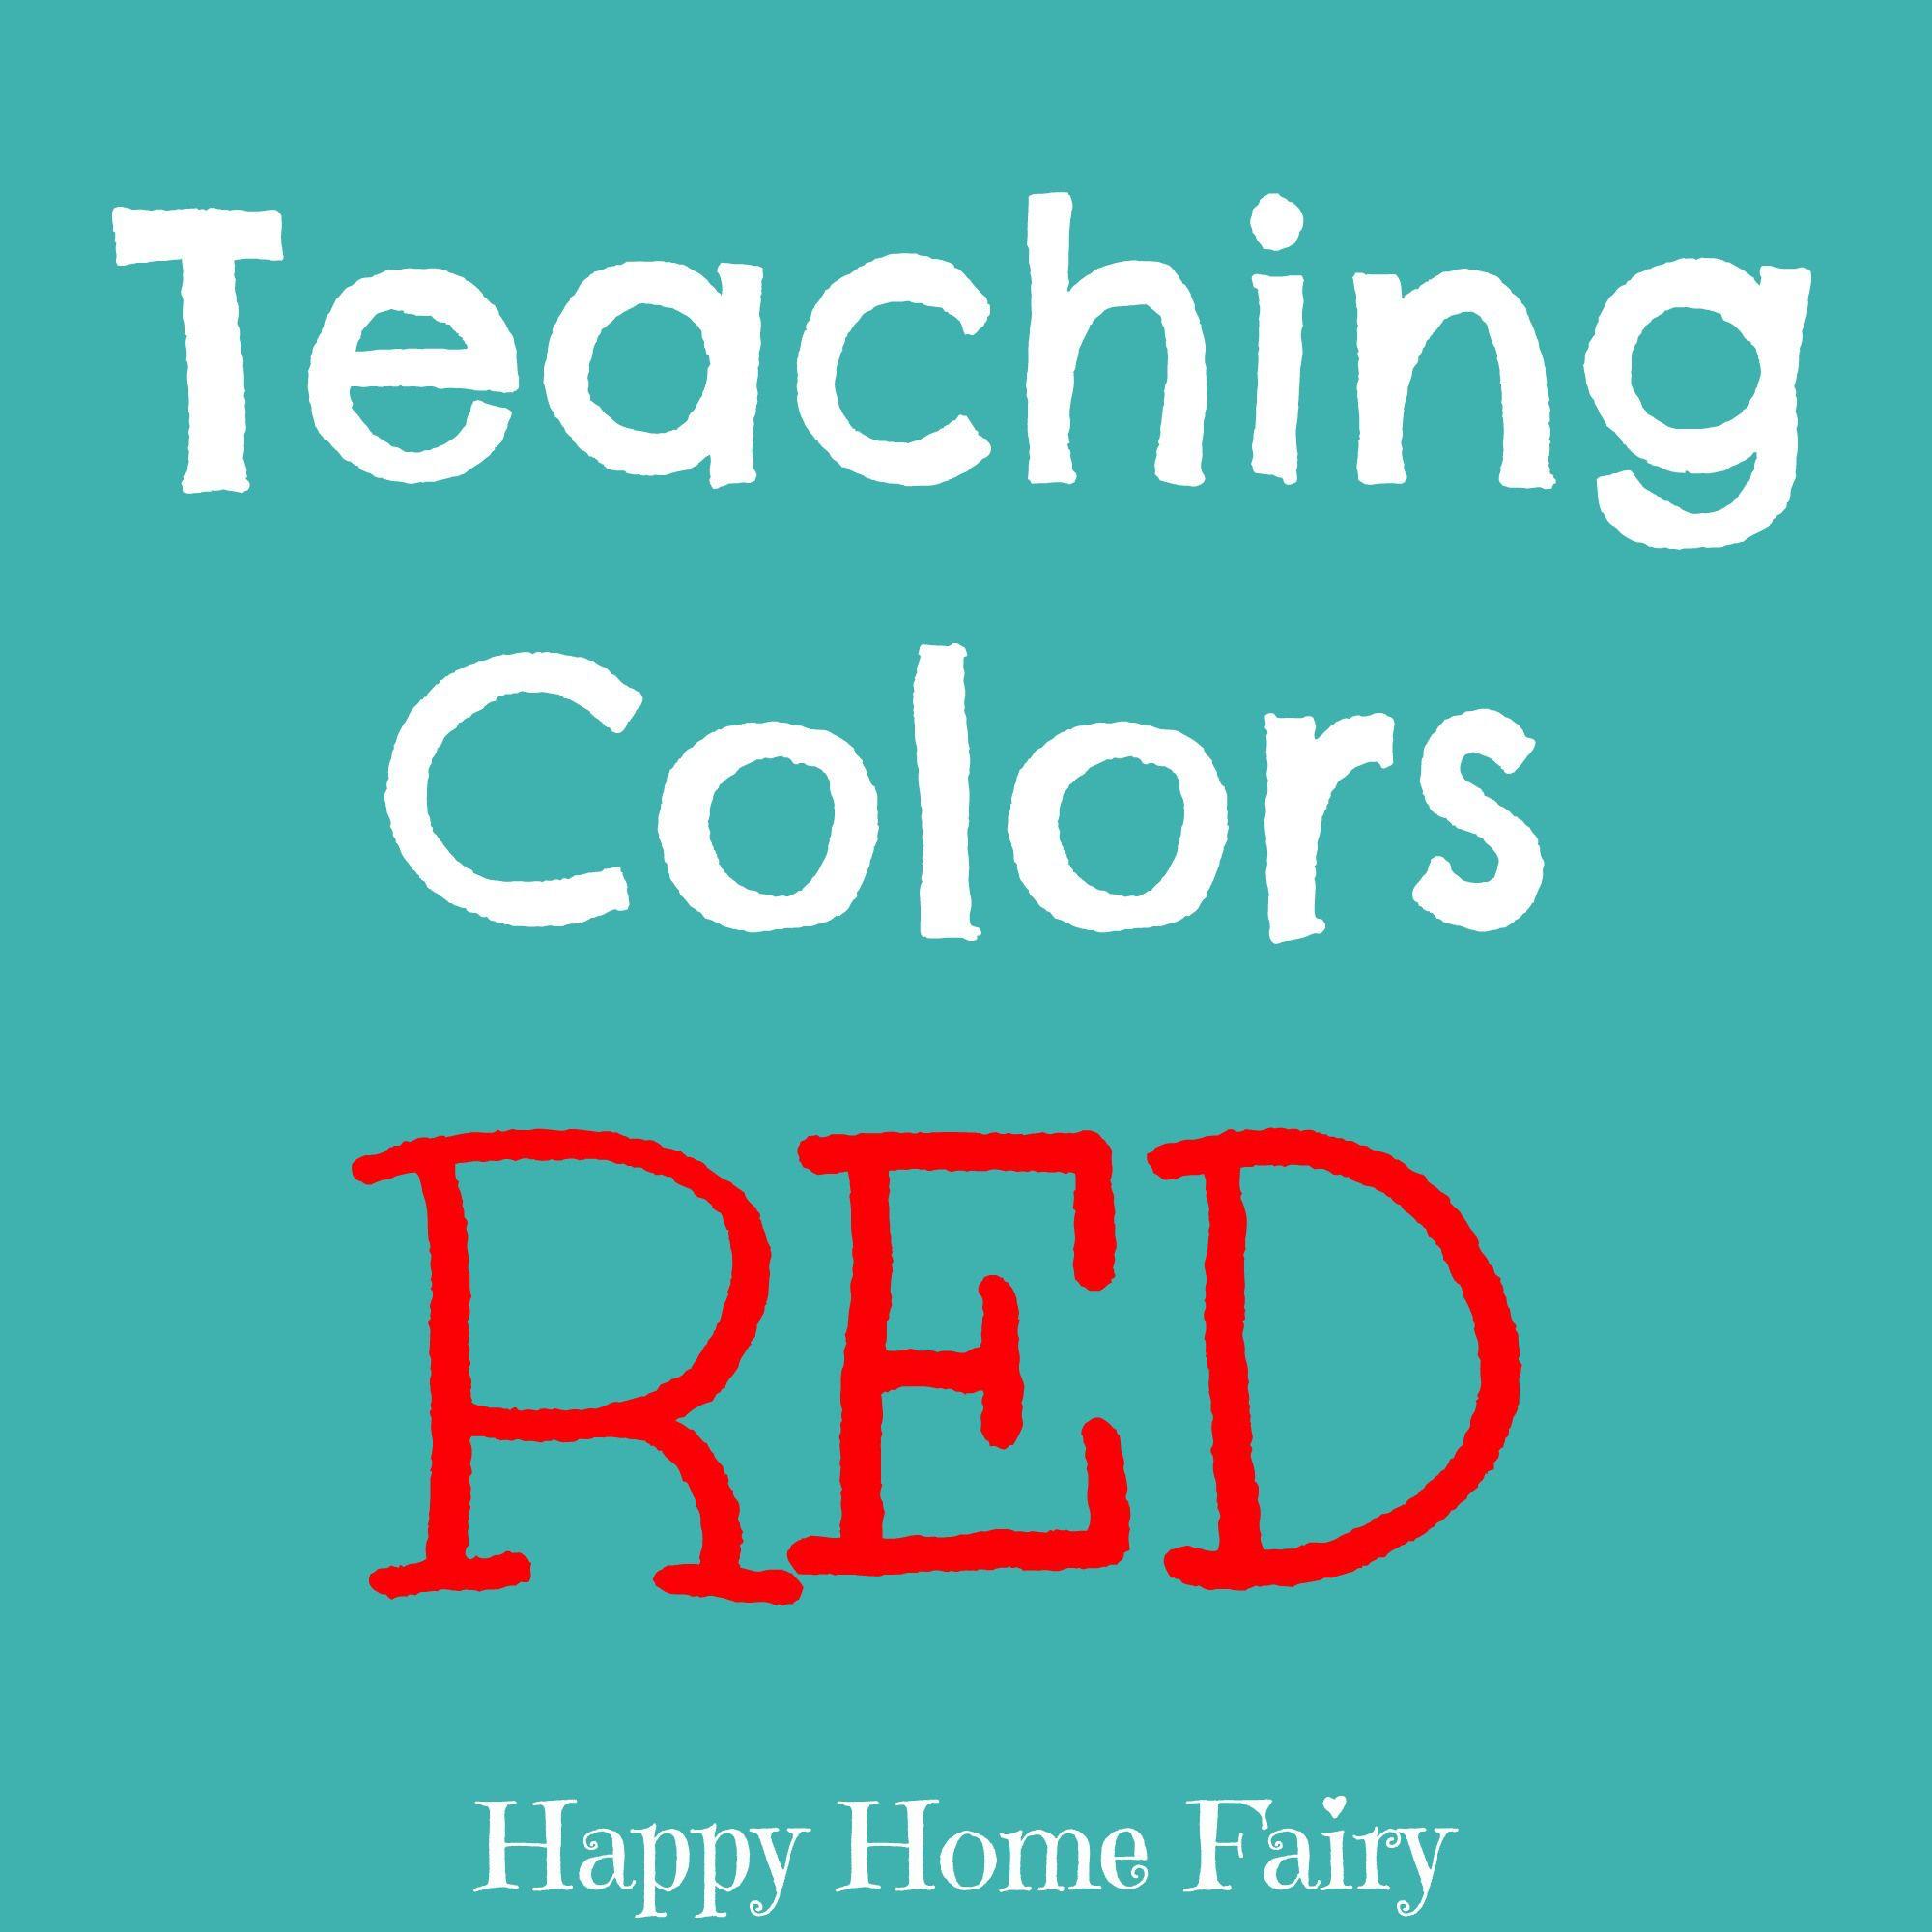 Teaching Colors - Red | Teaching Preschool | Pinterest | Teaching ...